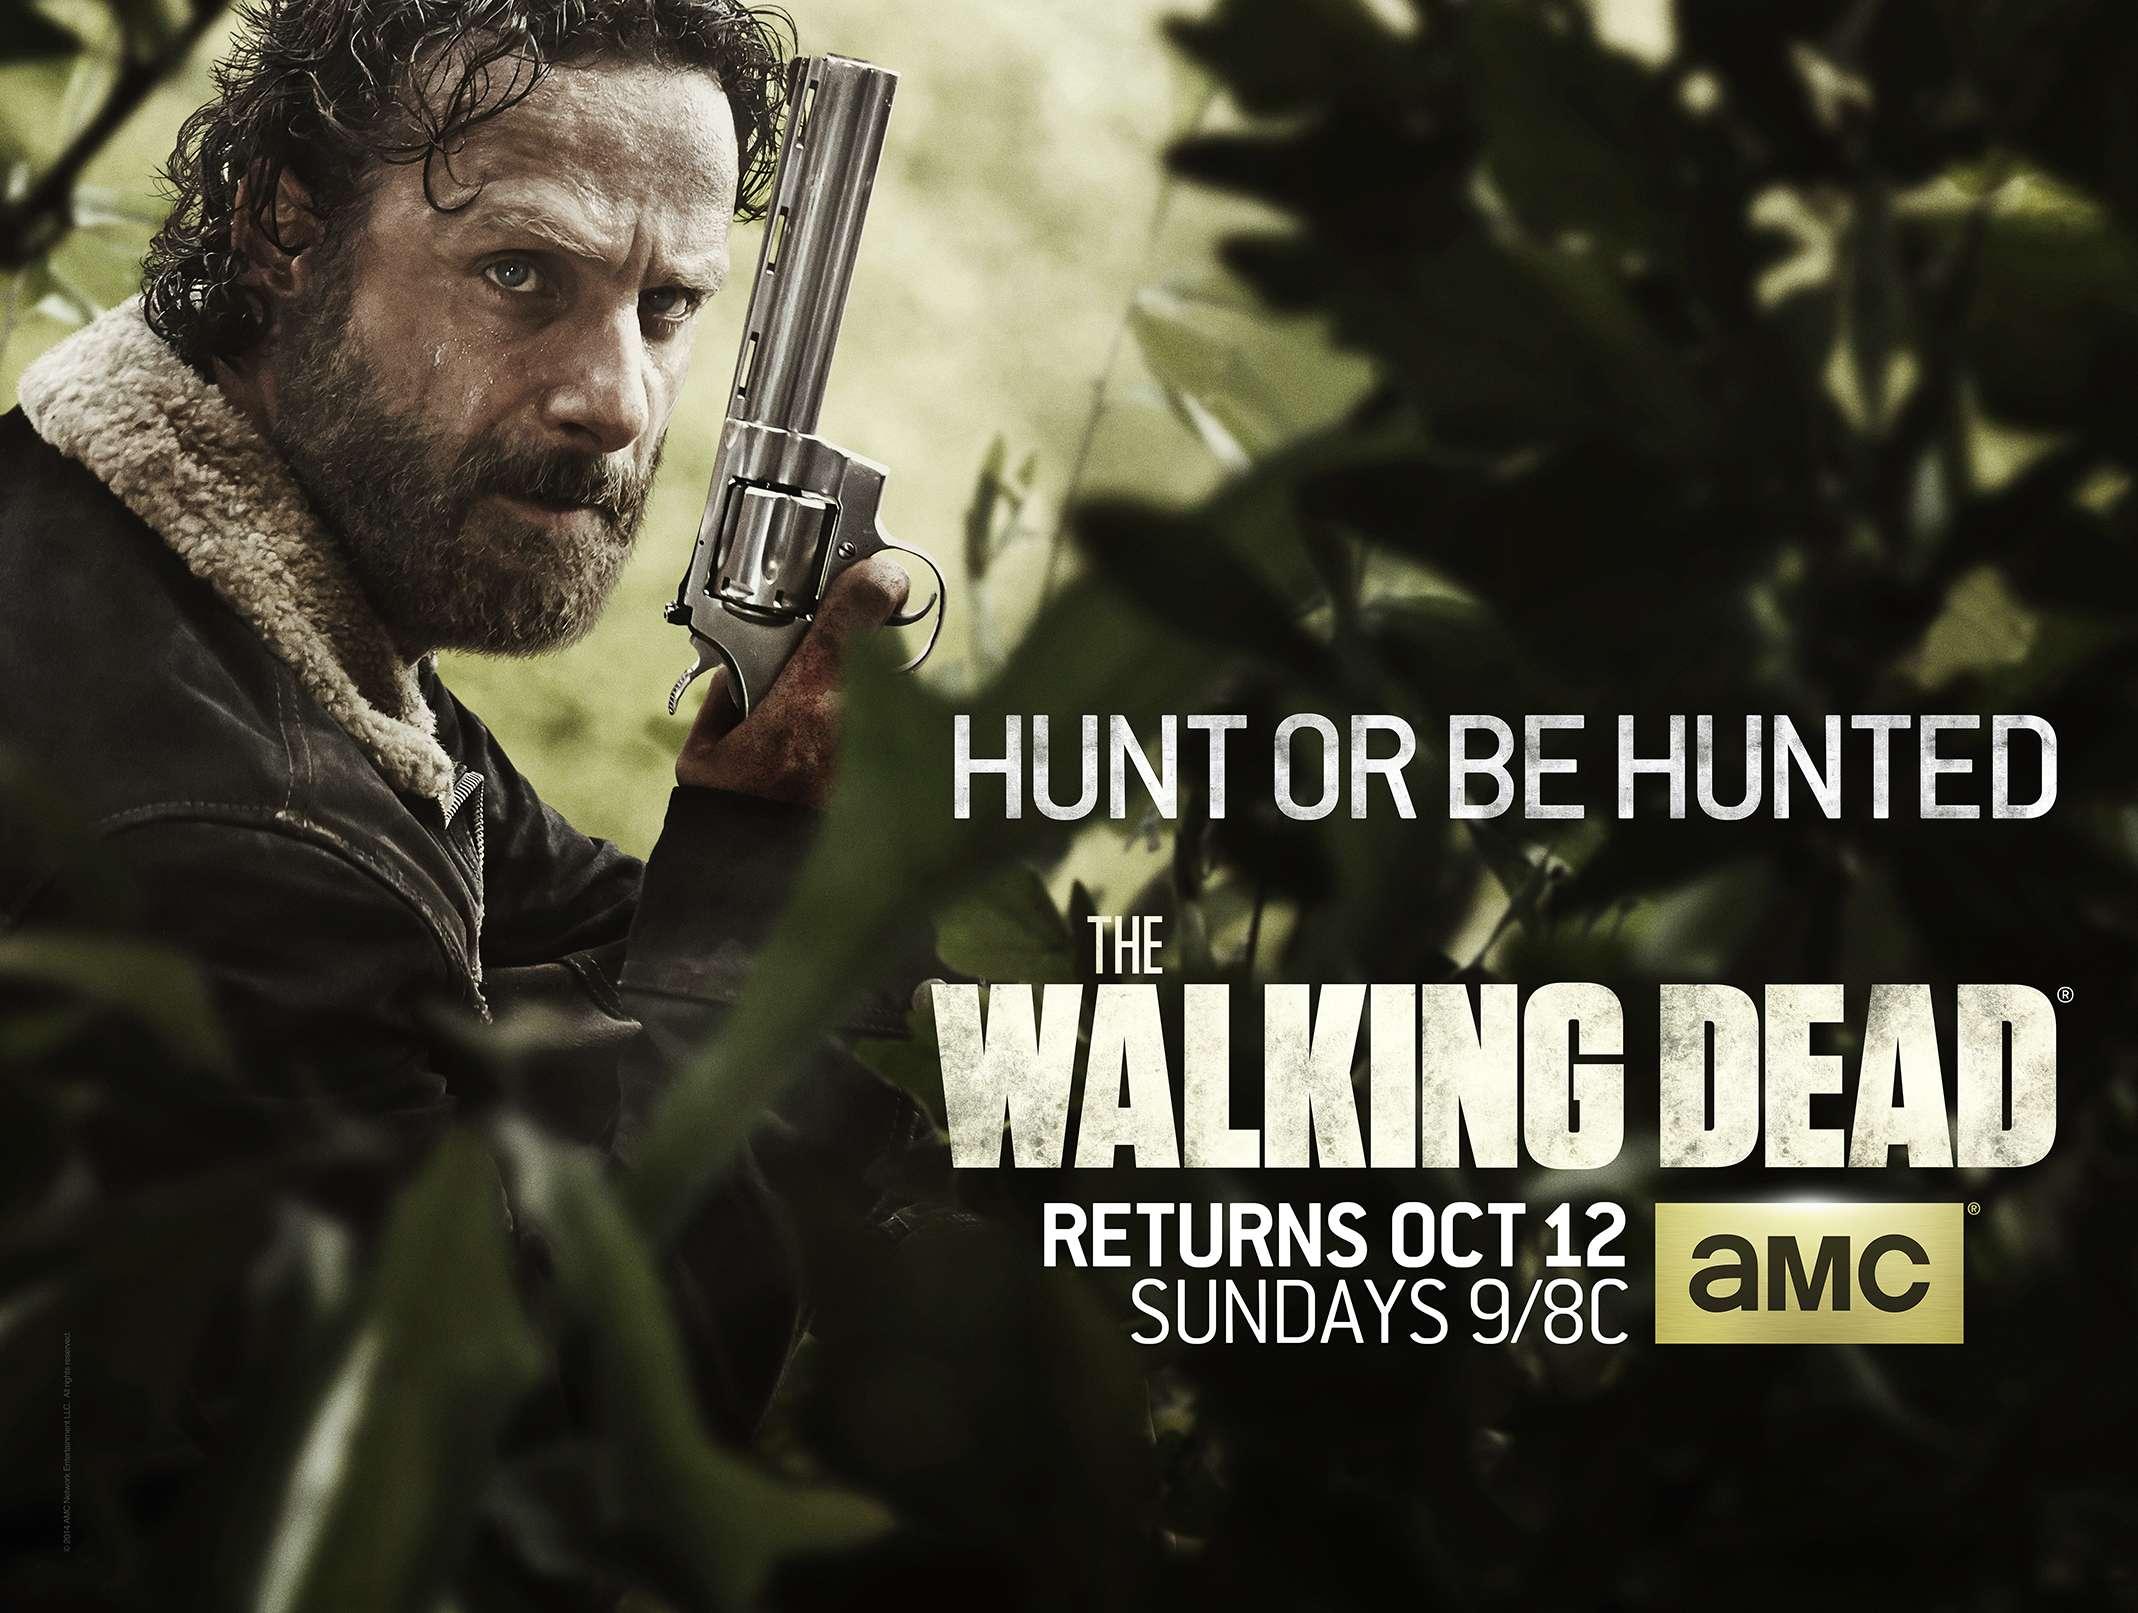 The Walking Dead S05 720p 1080p WEB-DL | S05E01-E16